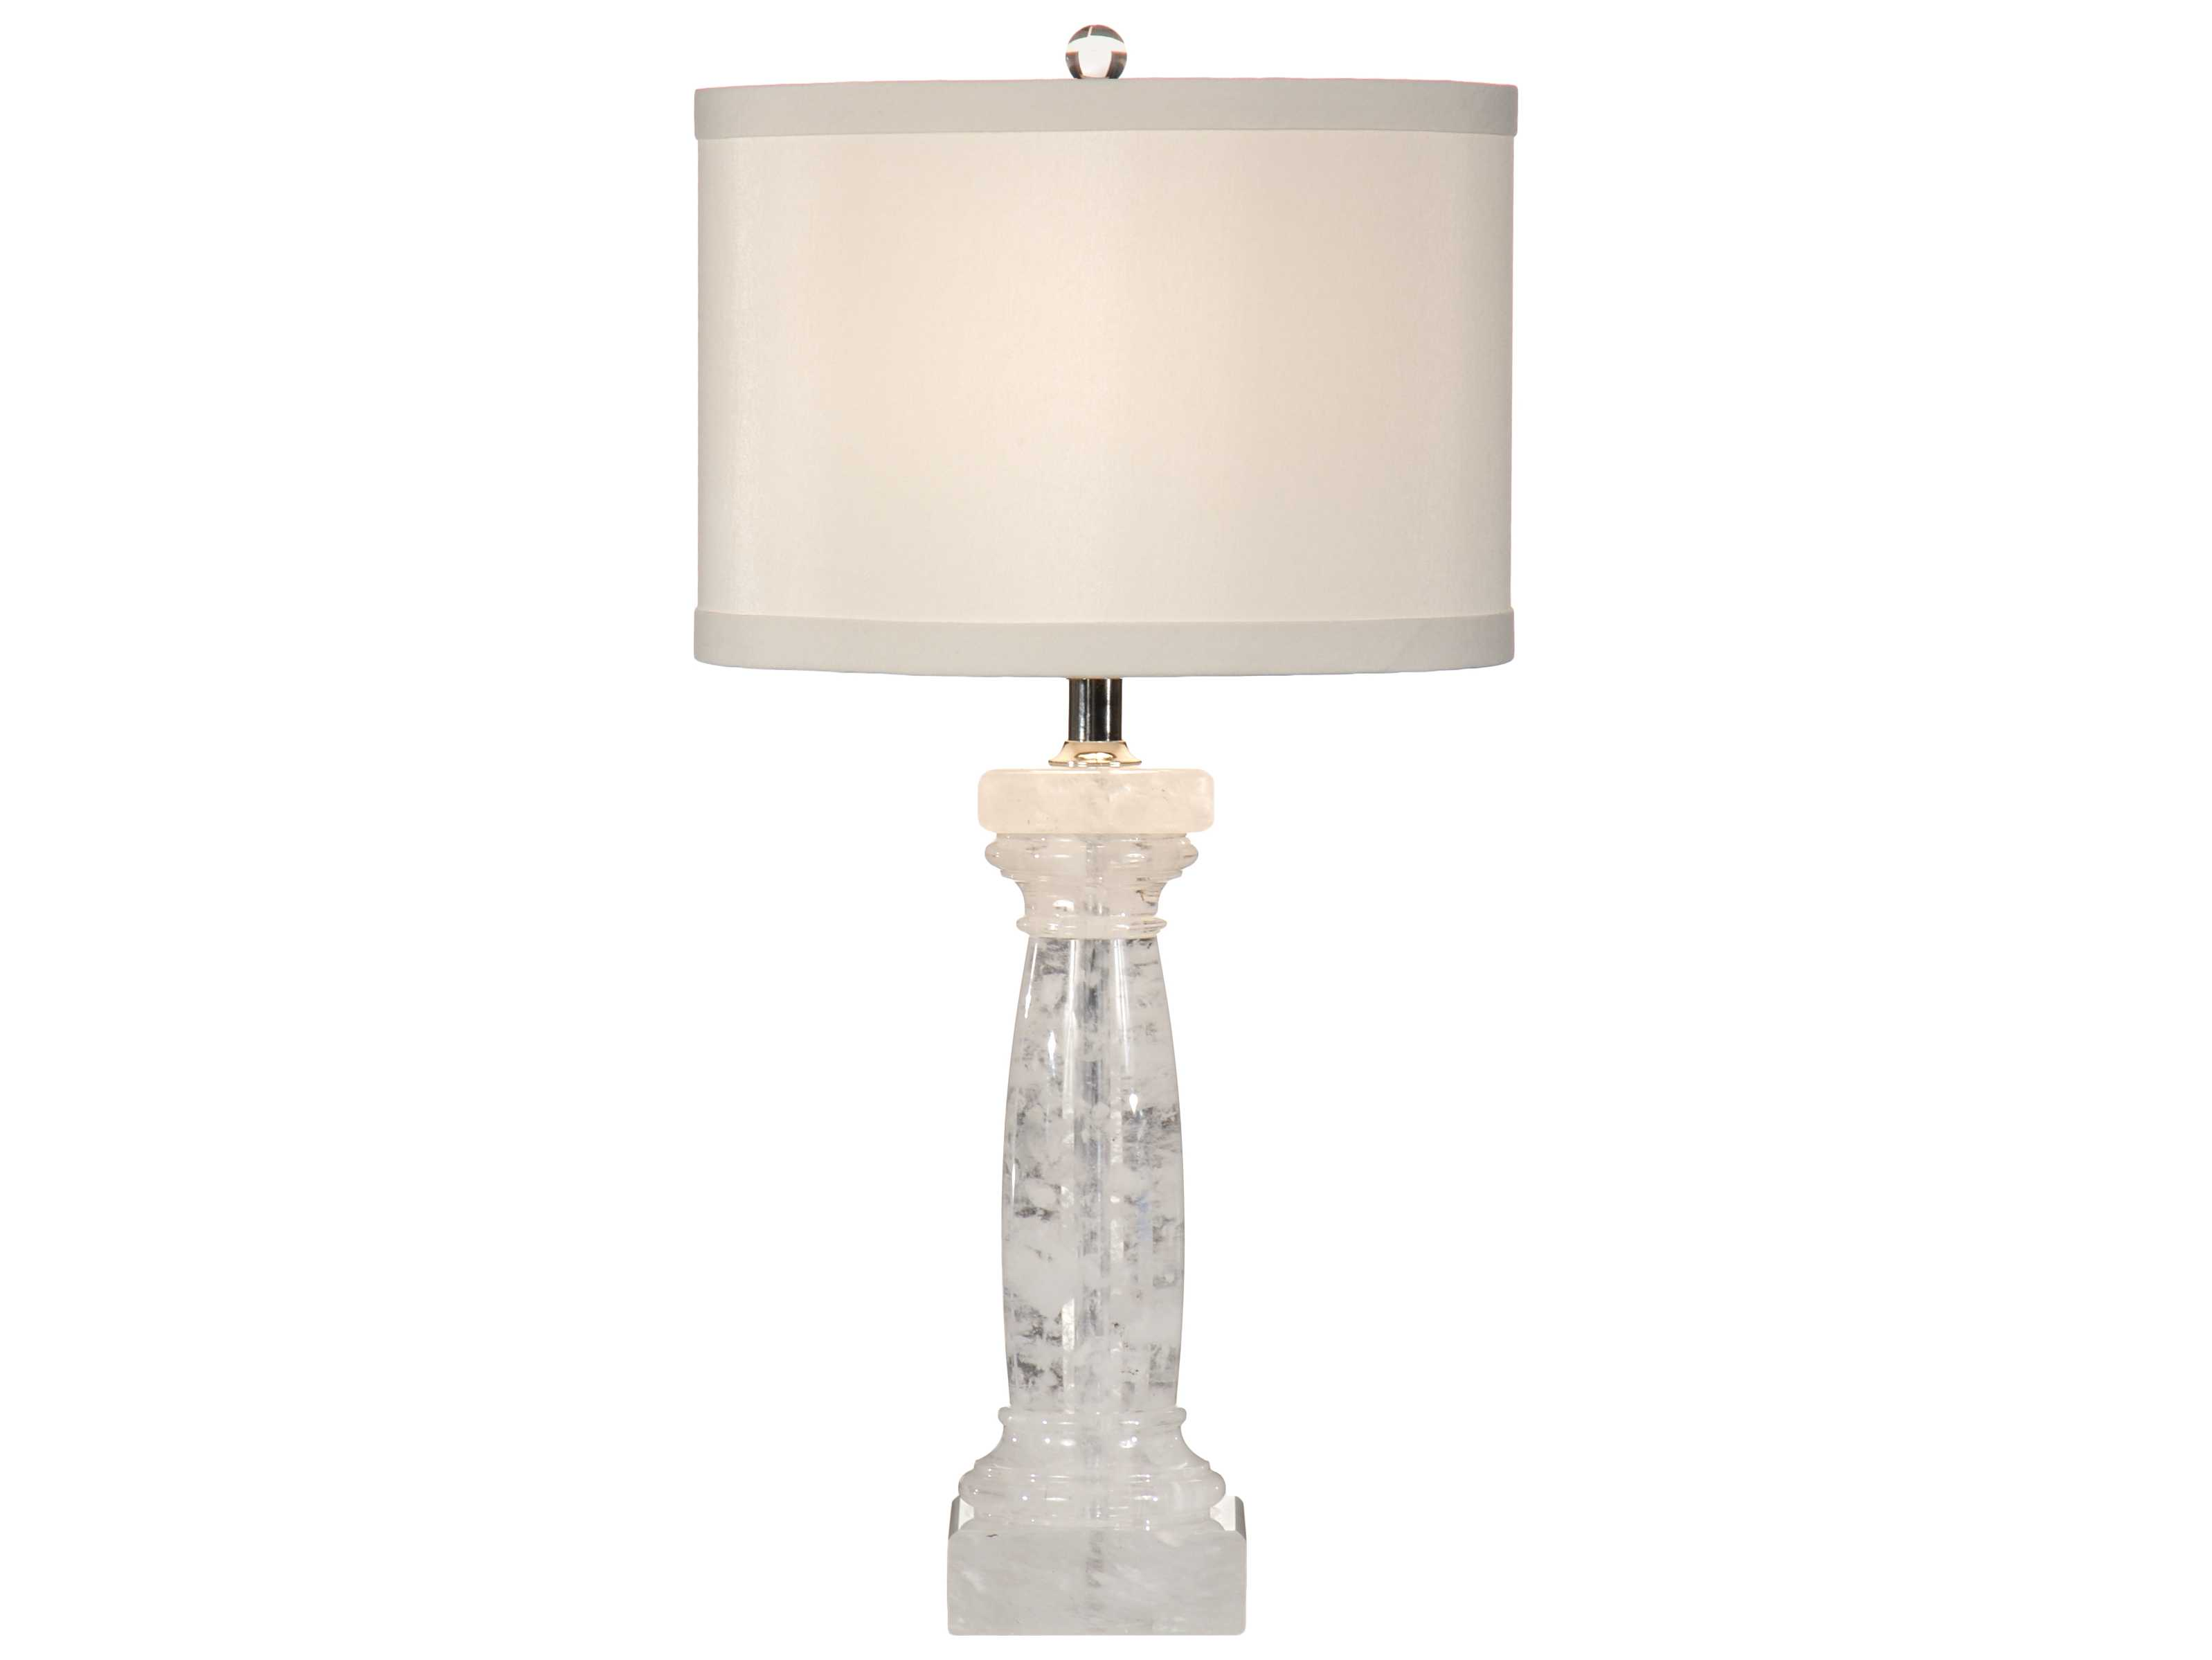 Wildwood lamps quarry rock crystal natural quartz table for Rock lamp